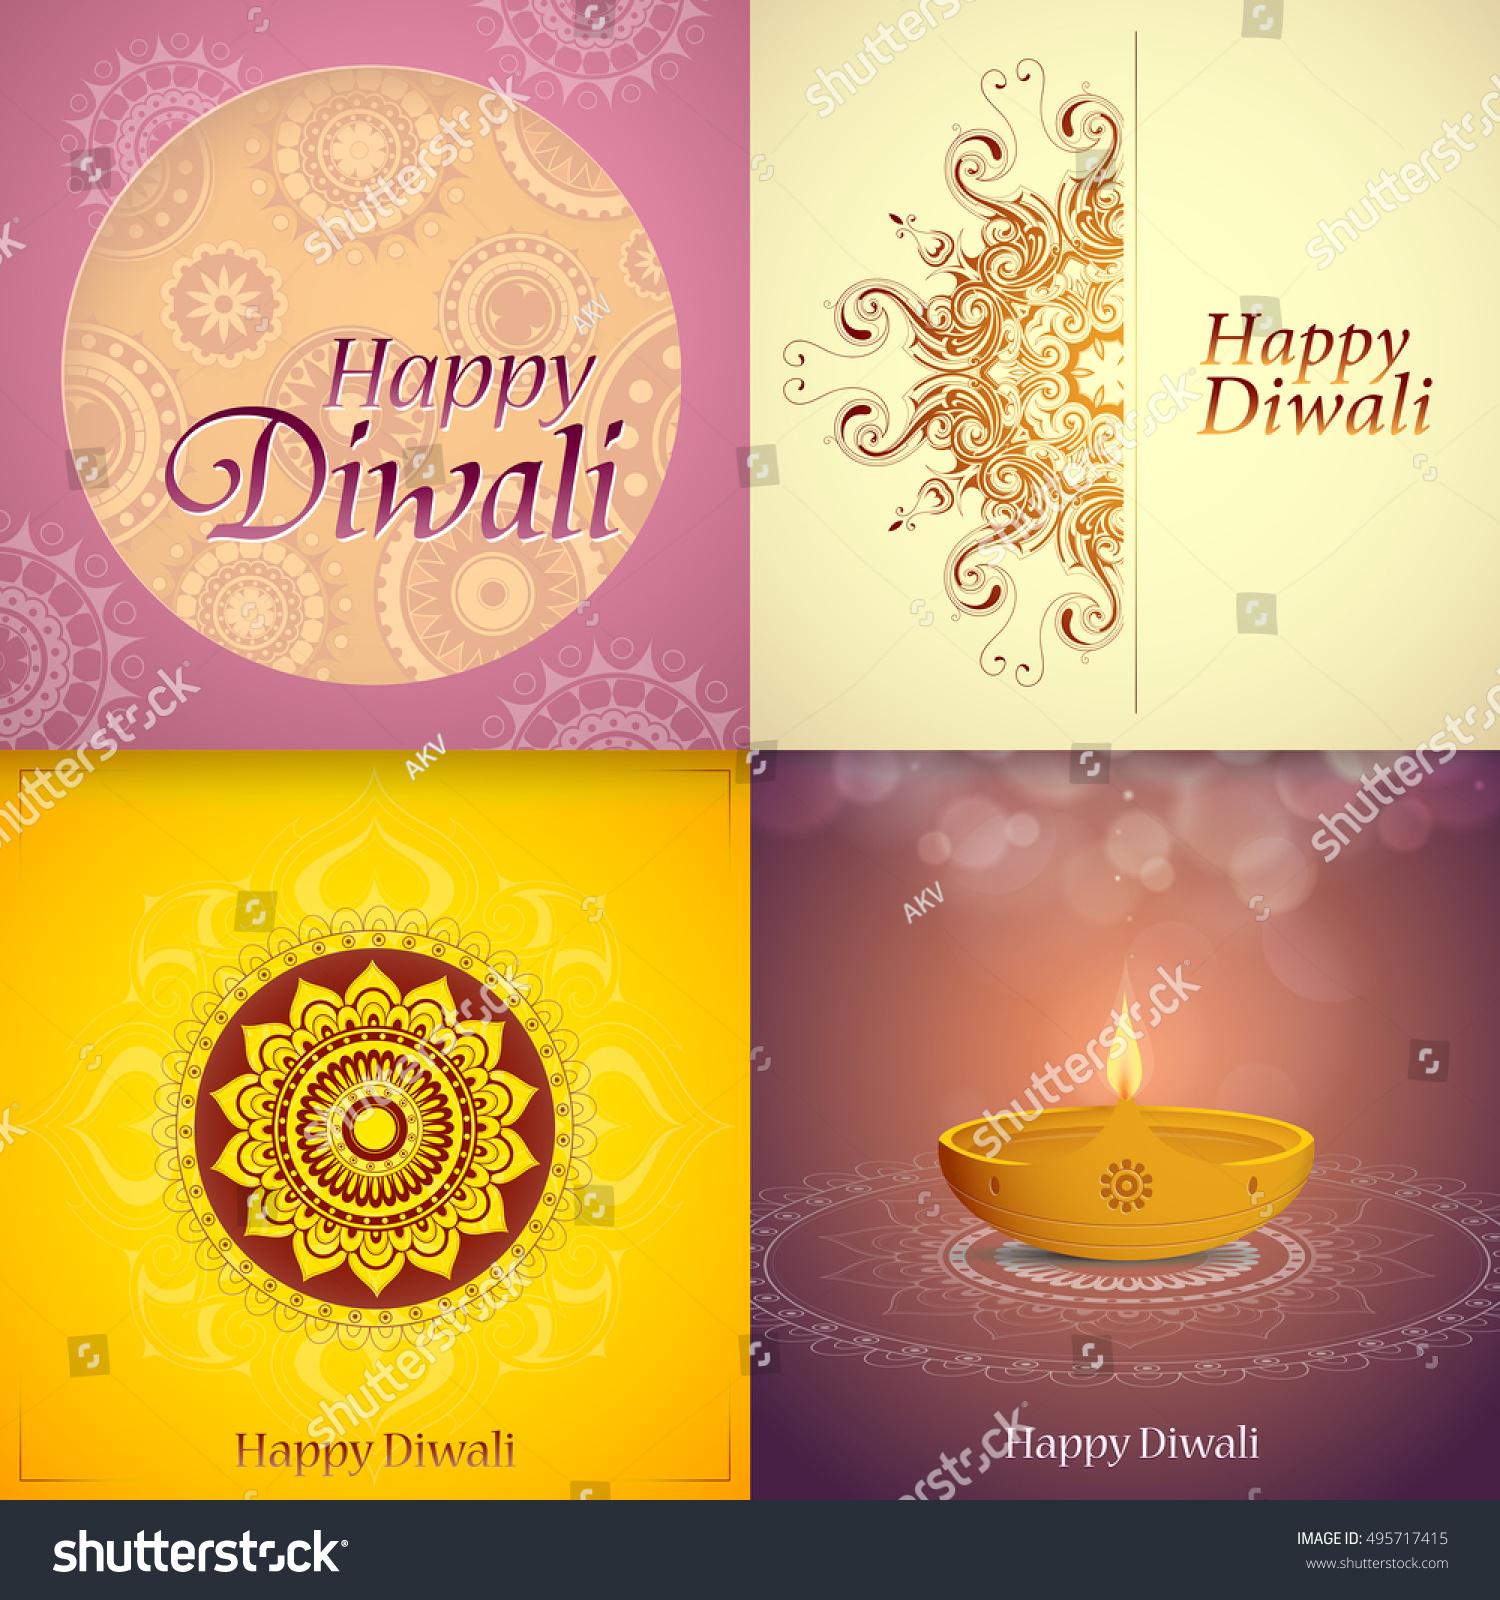 Set indian festival diwali greeting cards stock vector 495717415 set indian festival diwali greeting cards stock vector 495717415 shutterstock m4hsunfo